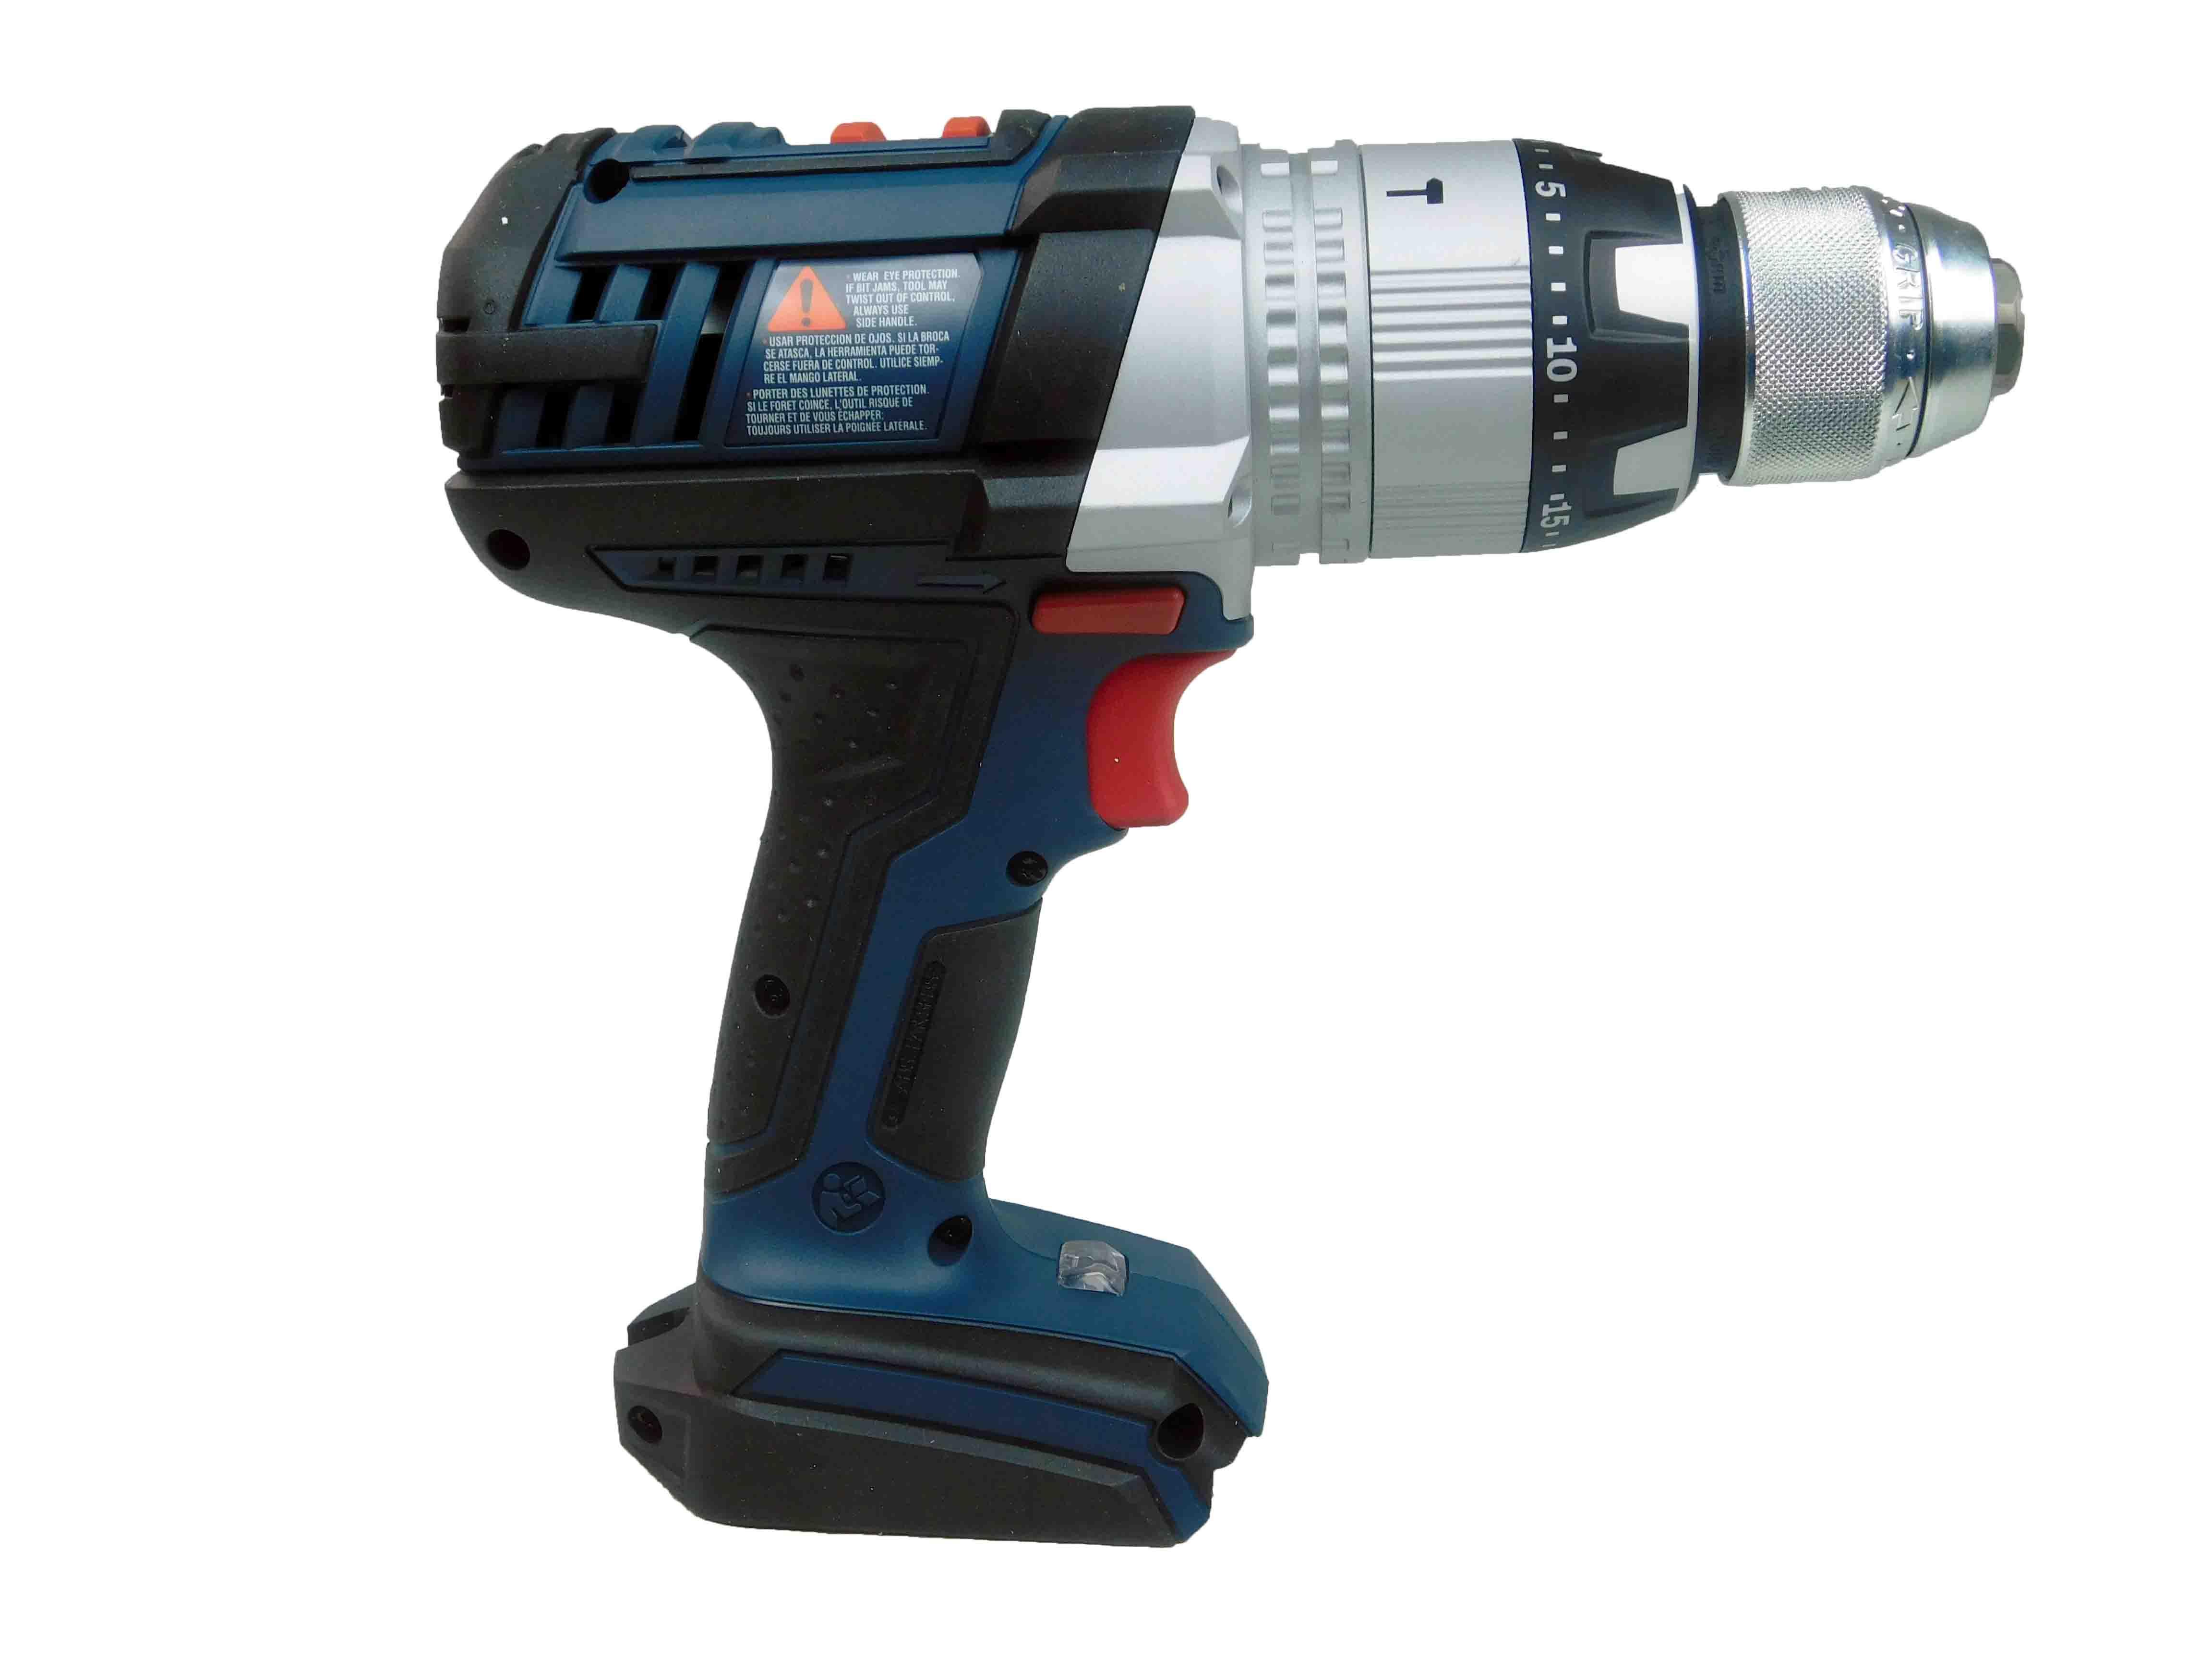 Bosch-HDH181XB18V-Brute-Tough-1-2-In.-Hammer-Drill-Driver-image-4